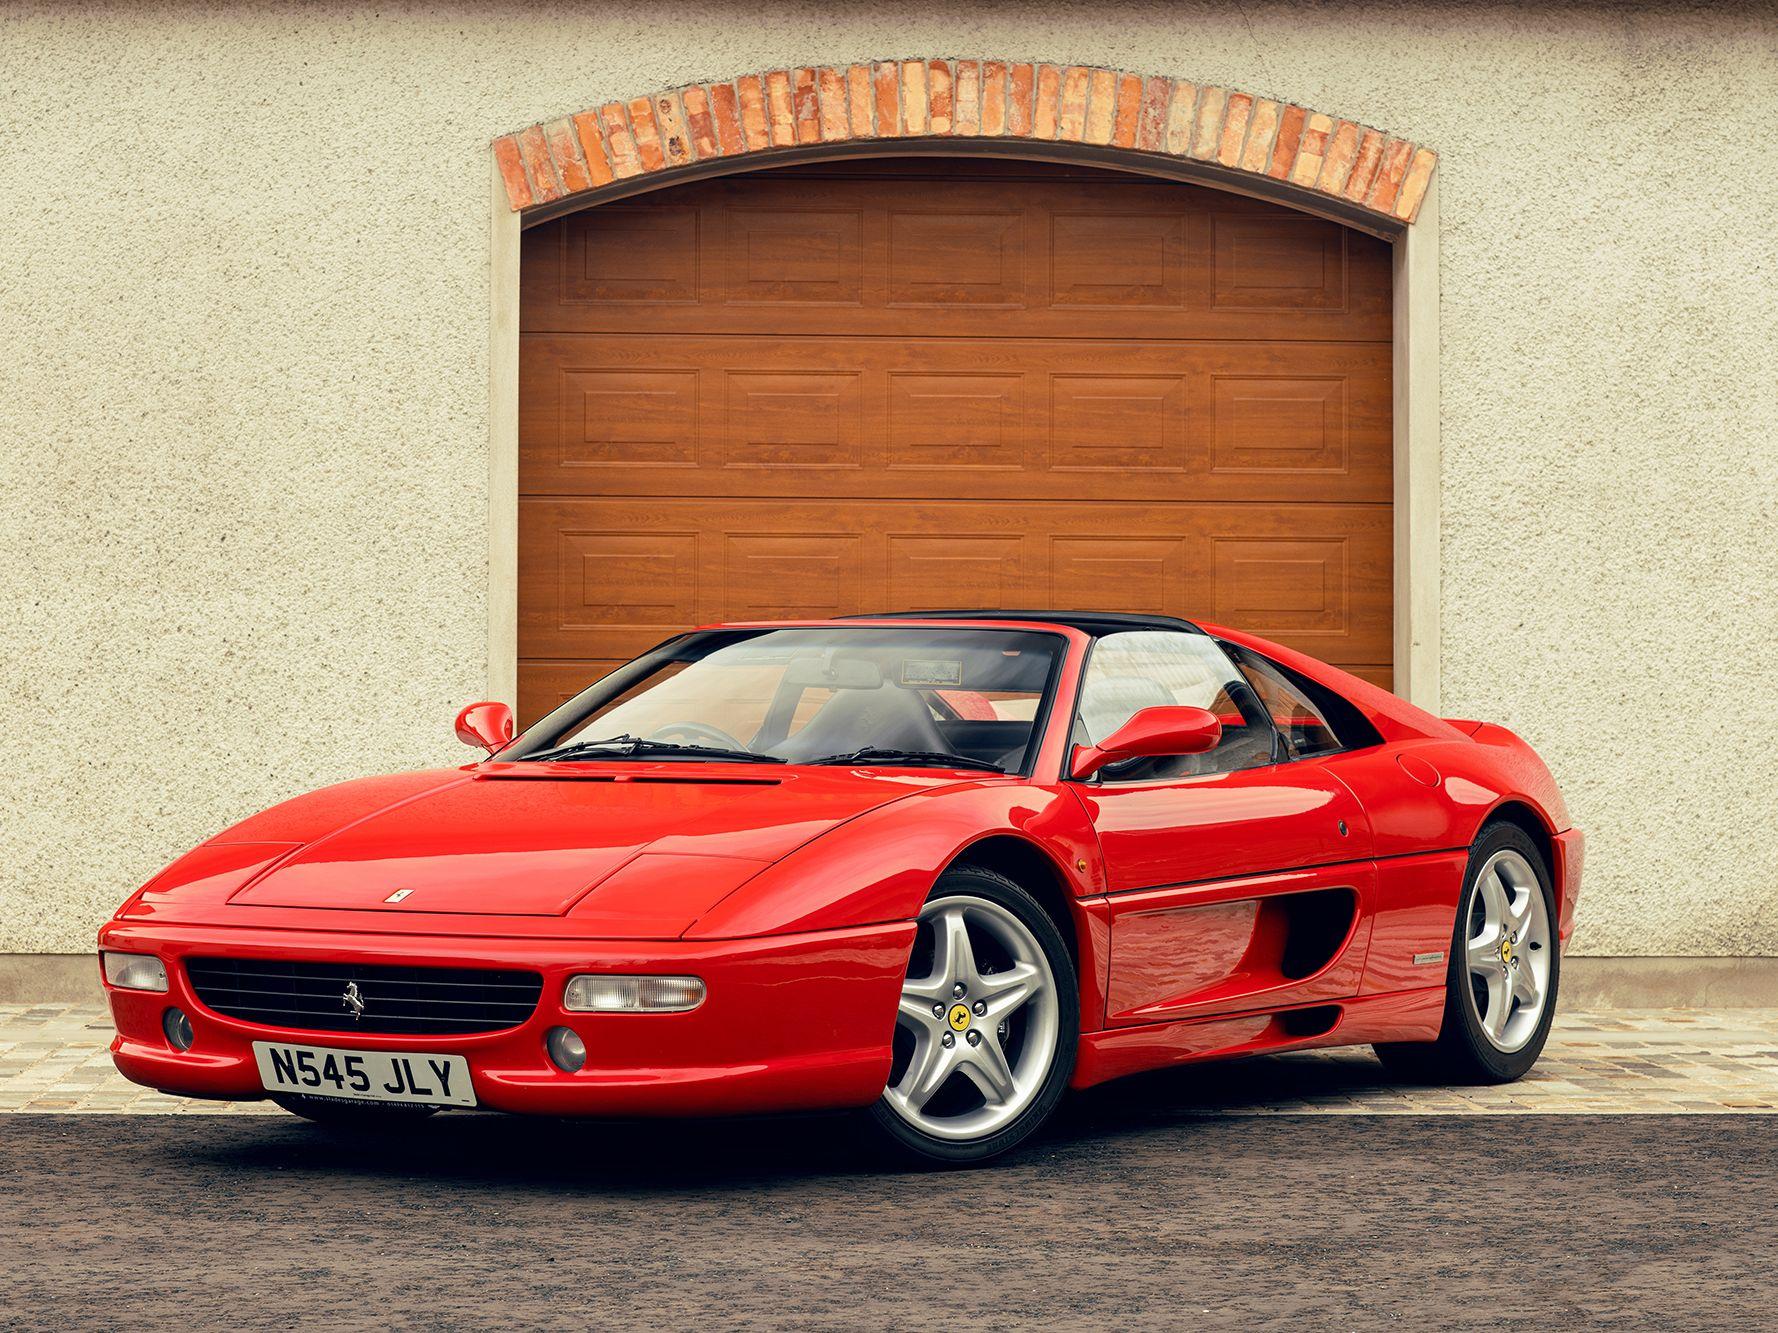 1996 Ferrari F355 GTS - Manual